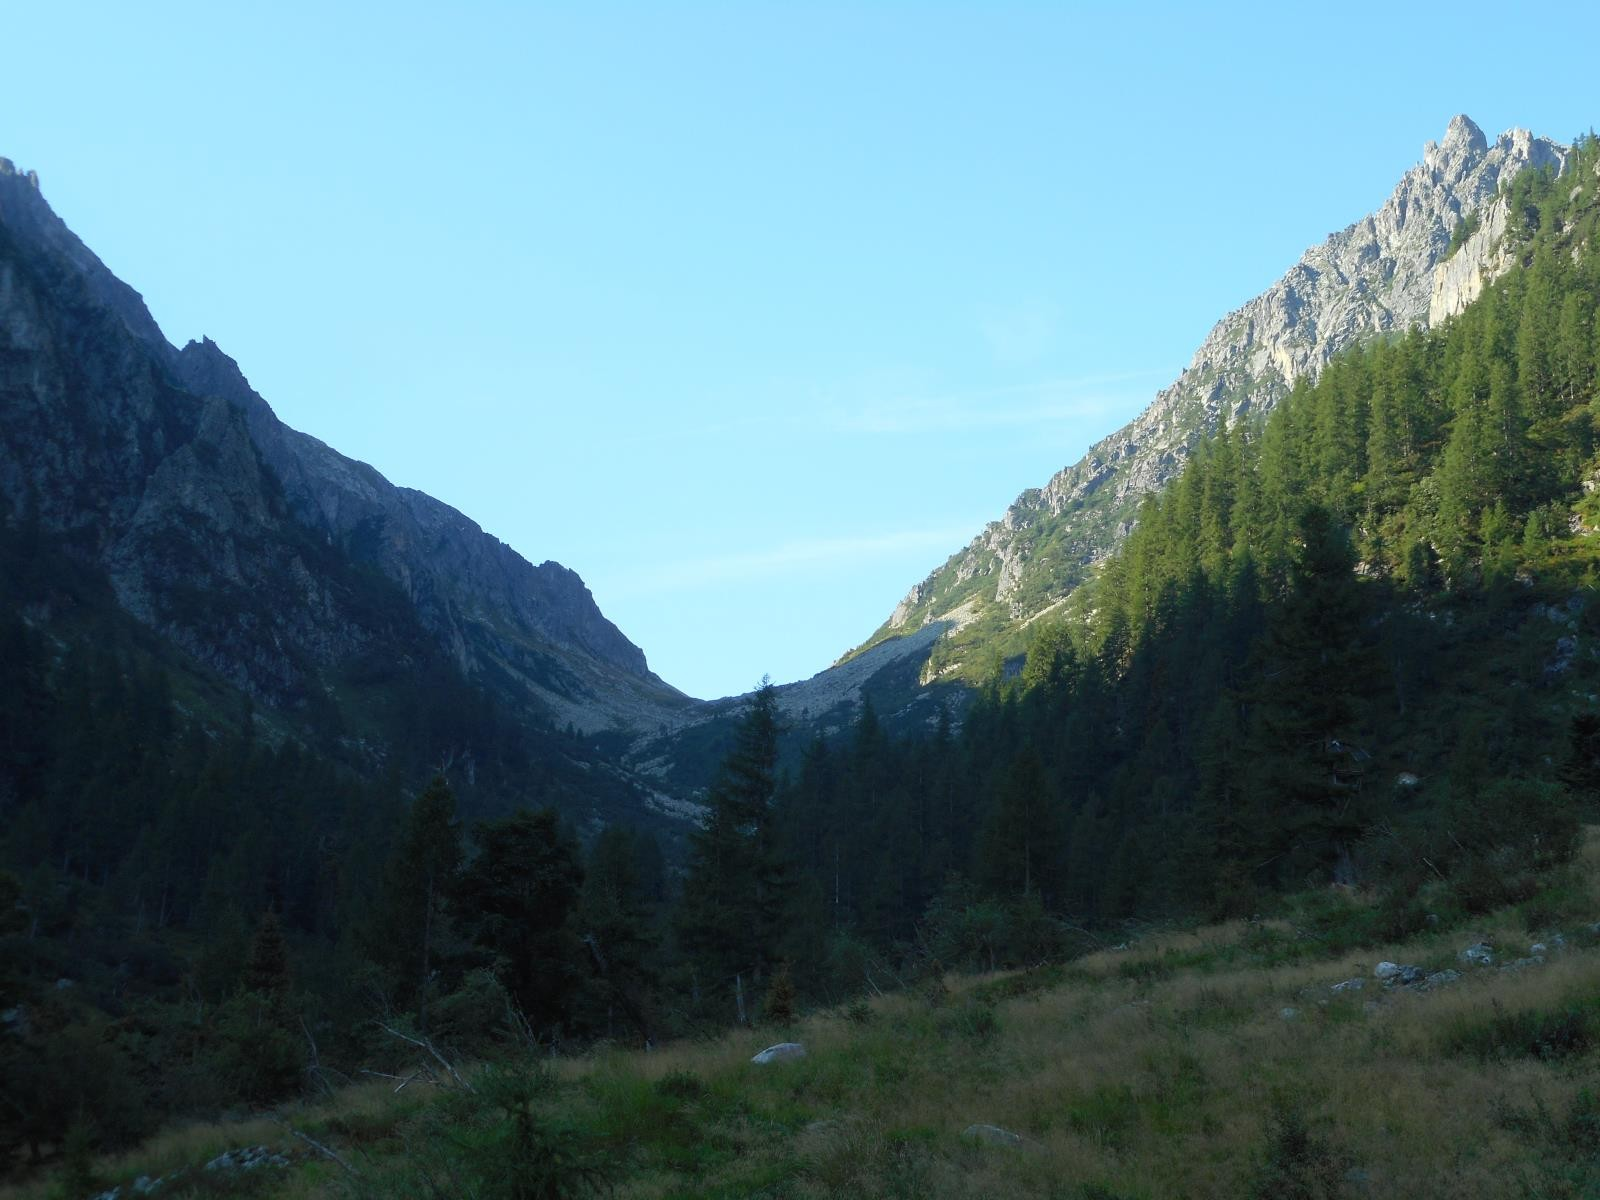 Montée vers la Forcla di Val regana